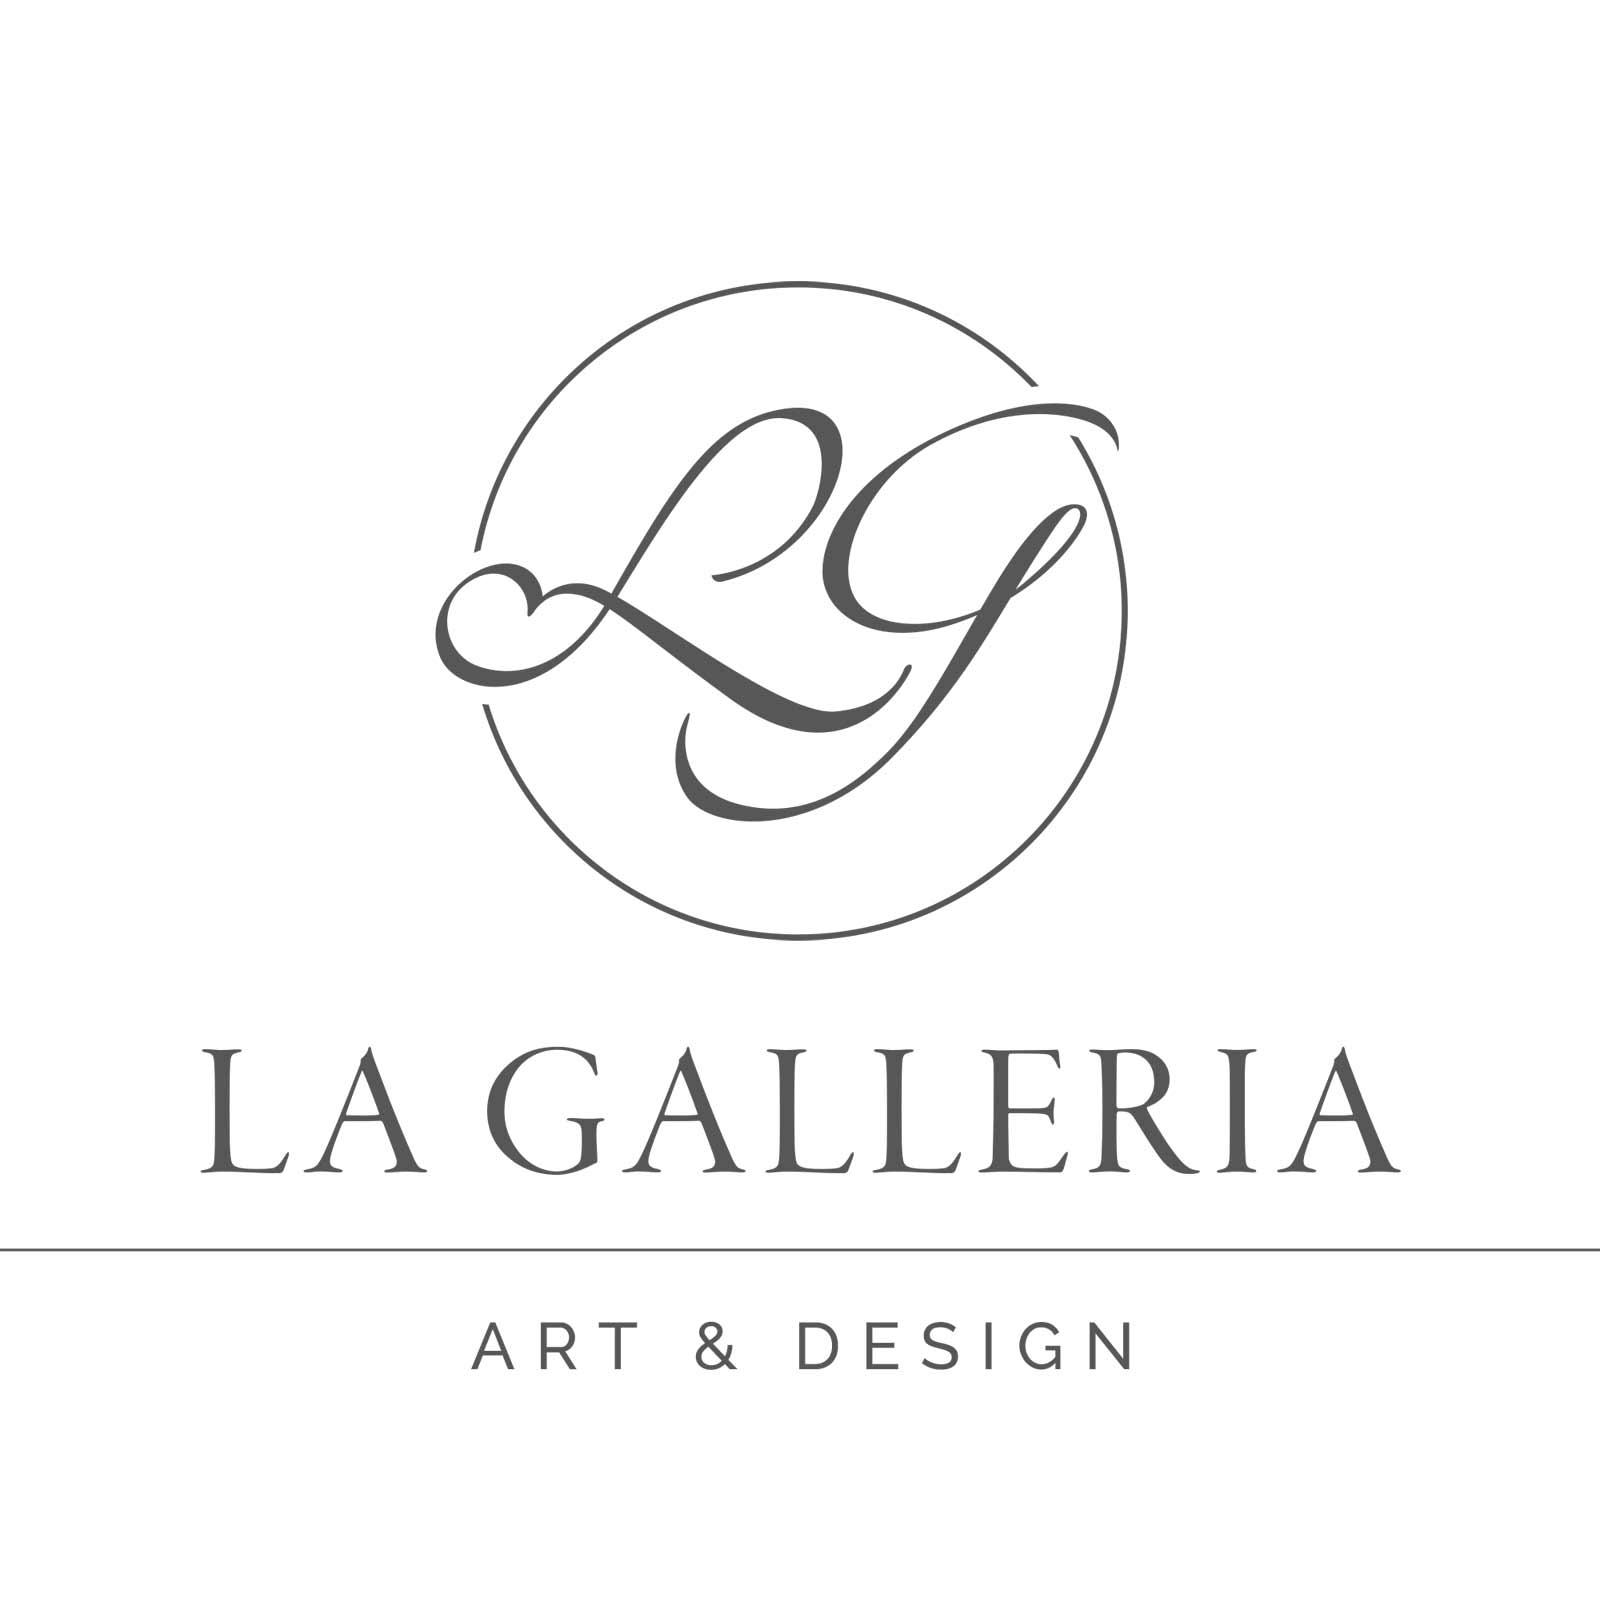 La Galleria Art & Design SEO, Graphic-Design, Fotografie, Foto-Retouching und Digital Photo-Composing ShowMyProject